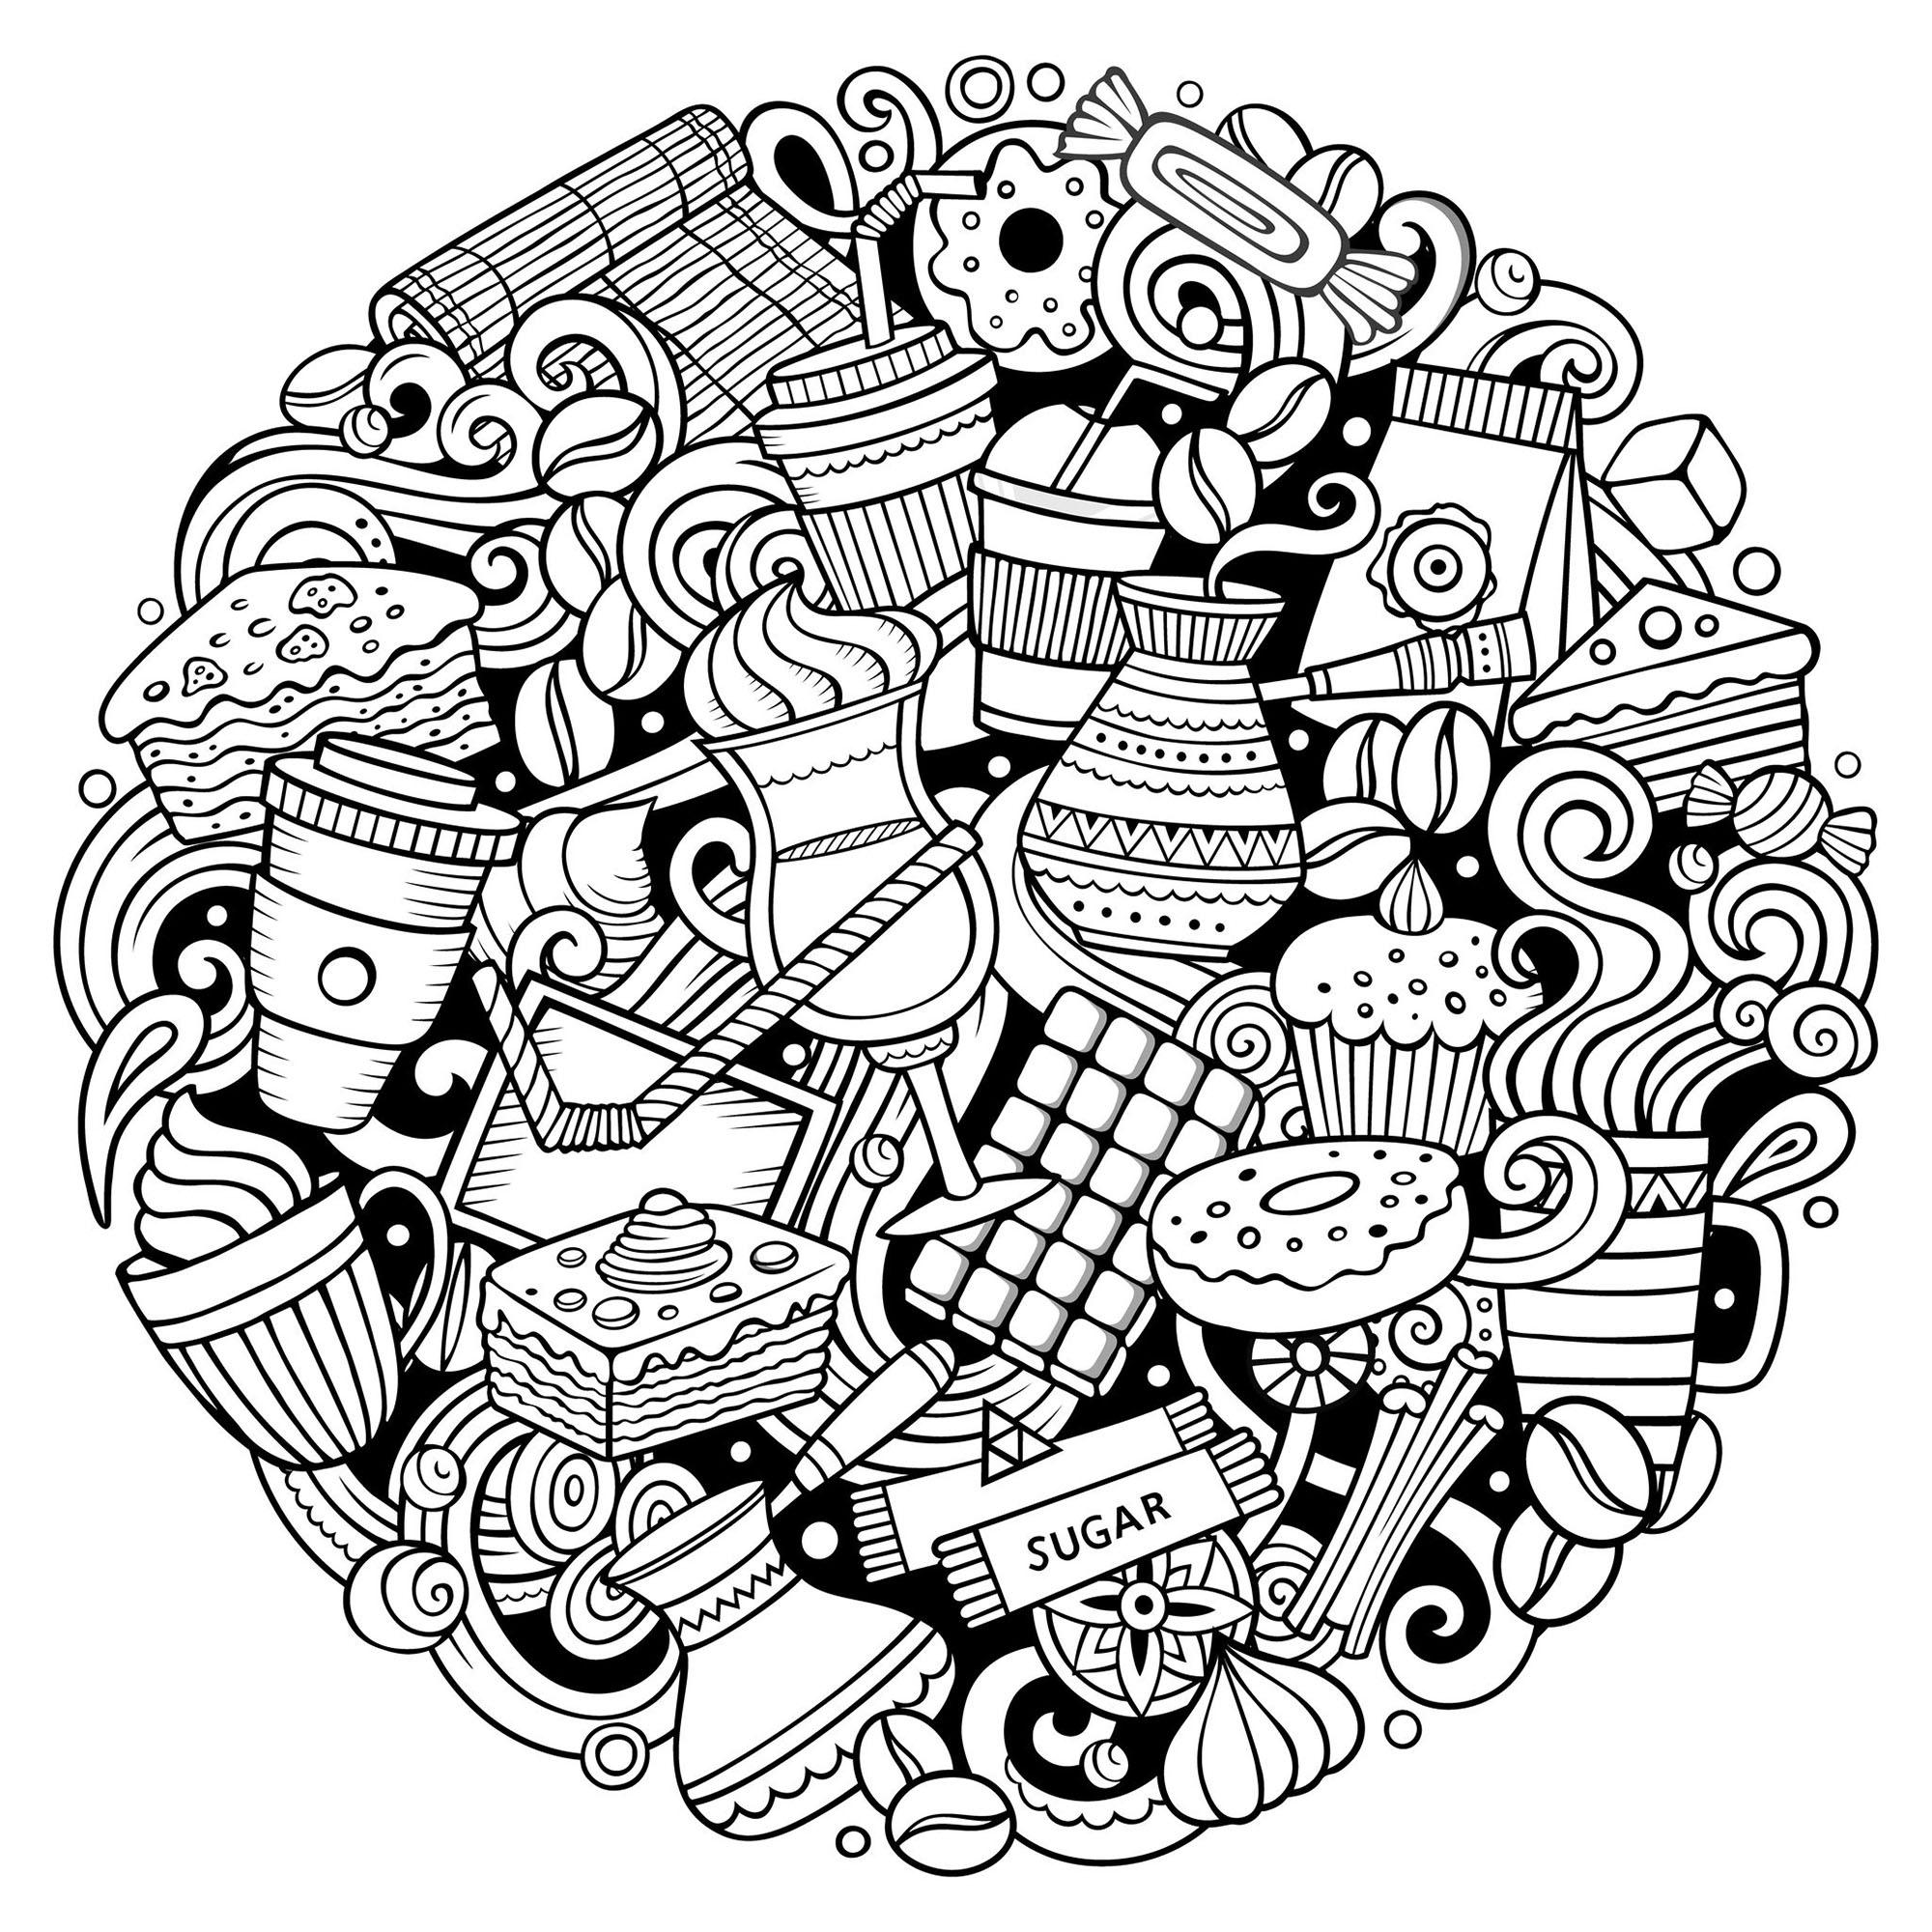 Colorear para Adultos : Cup Cakes - 15